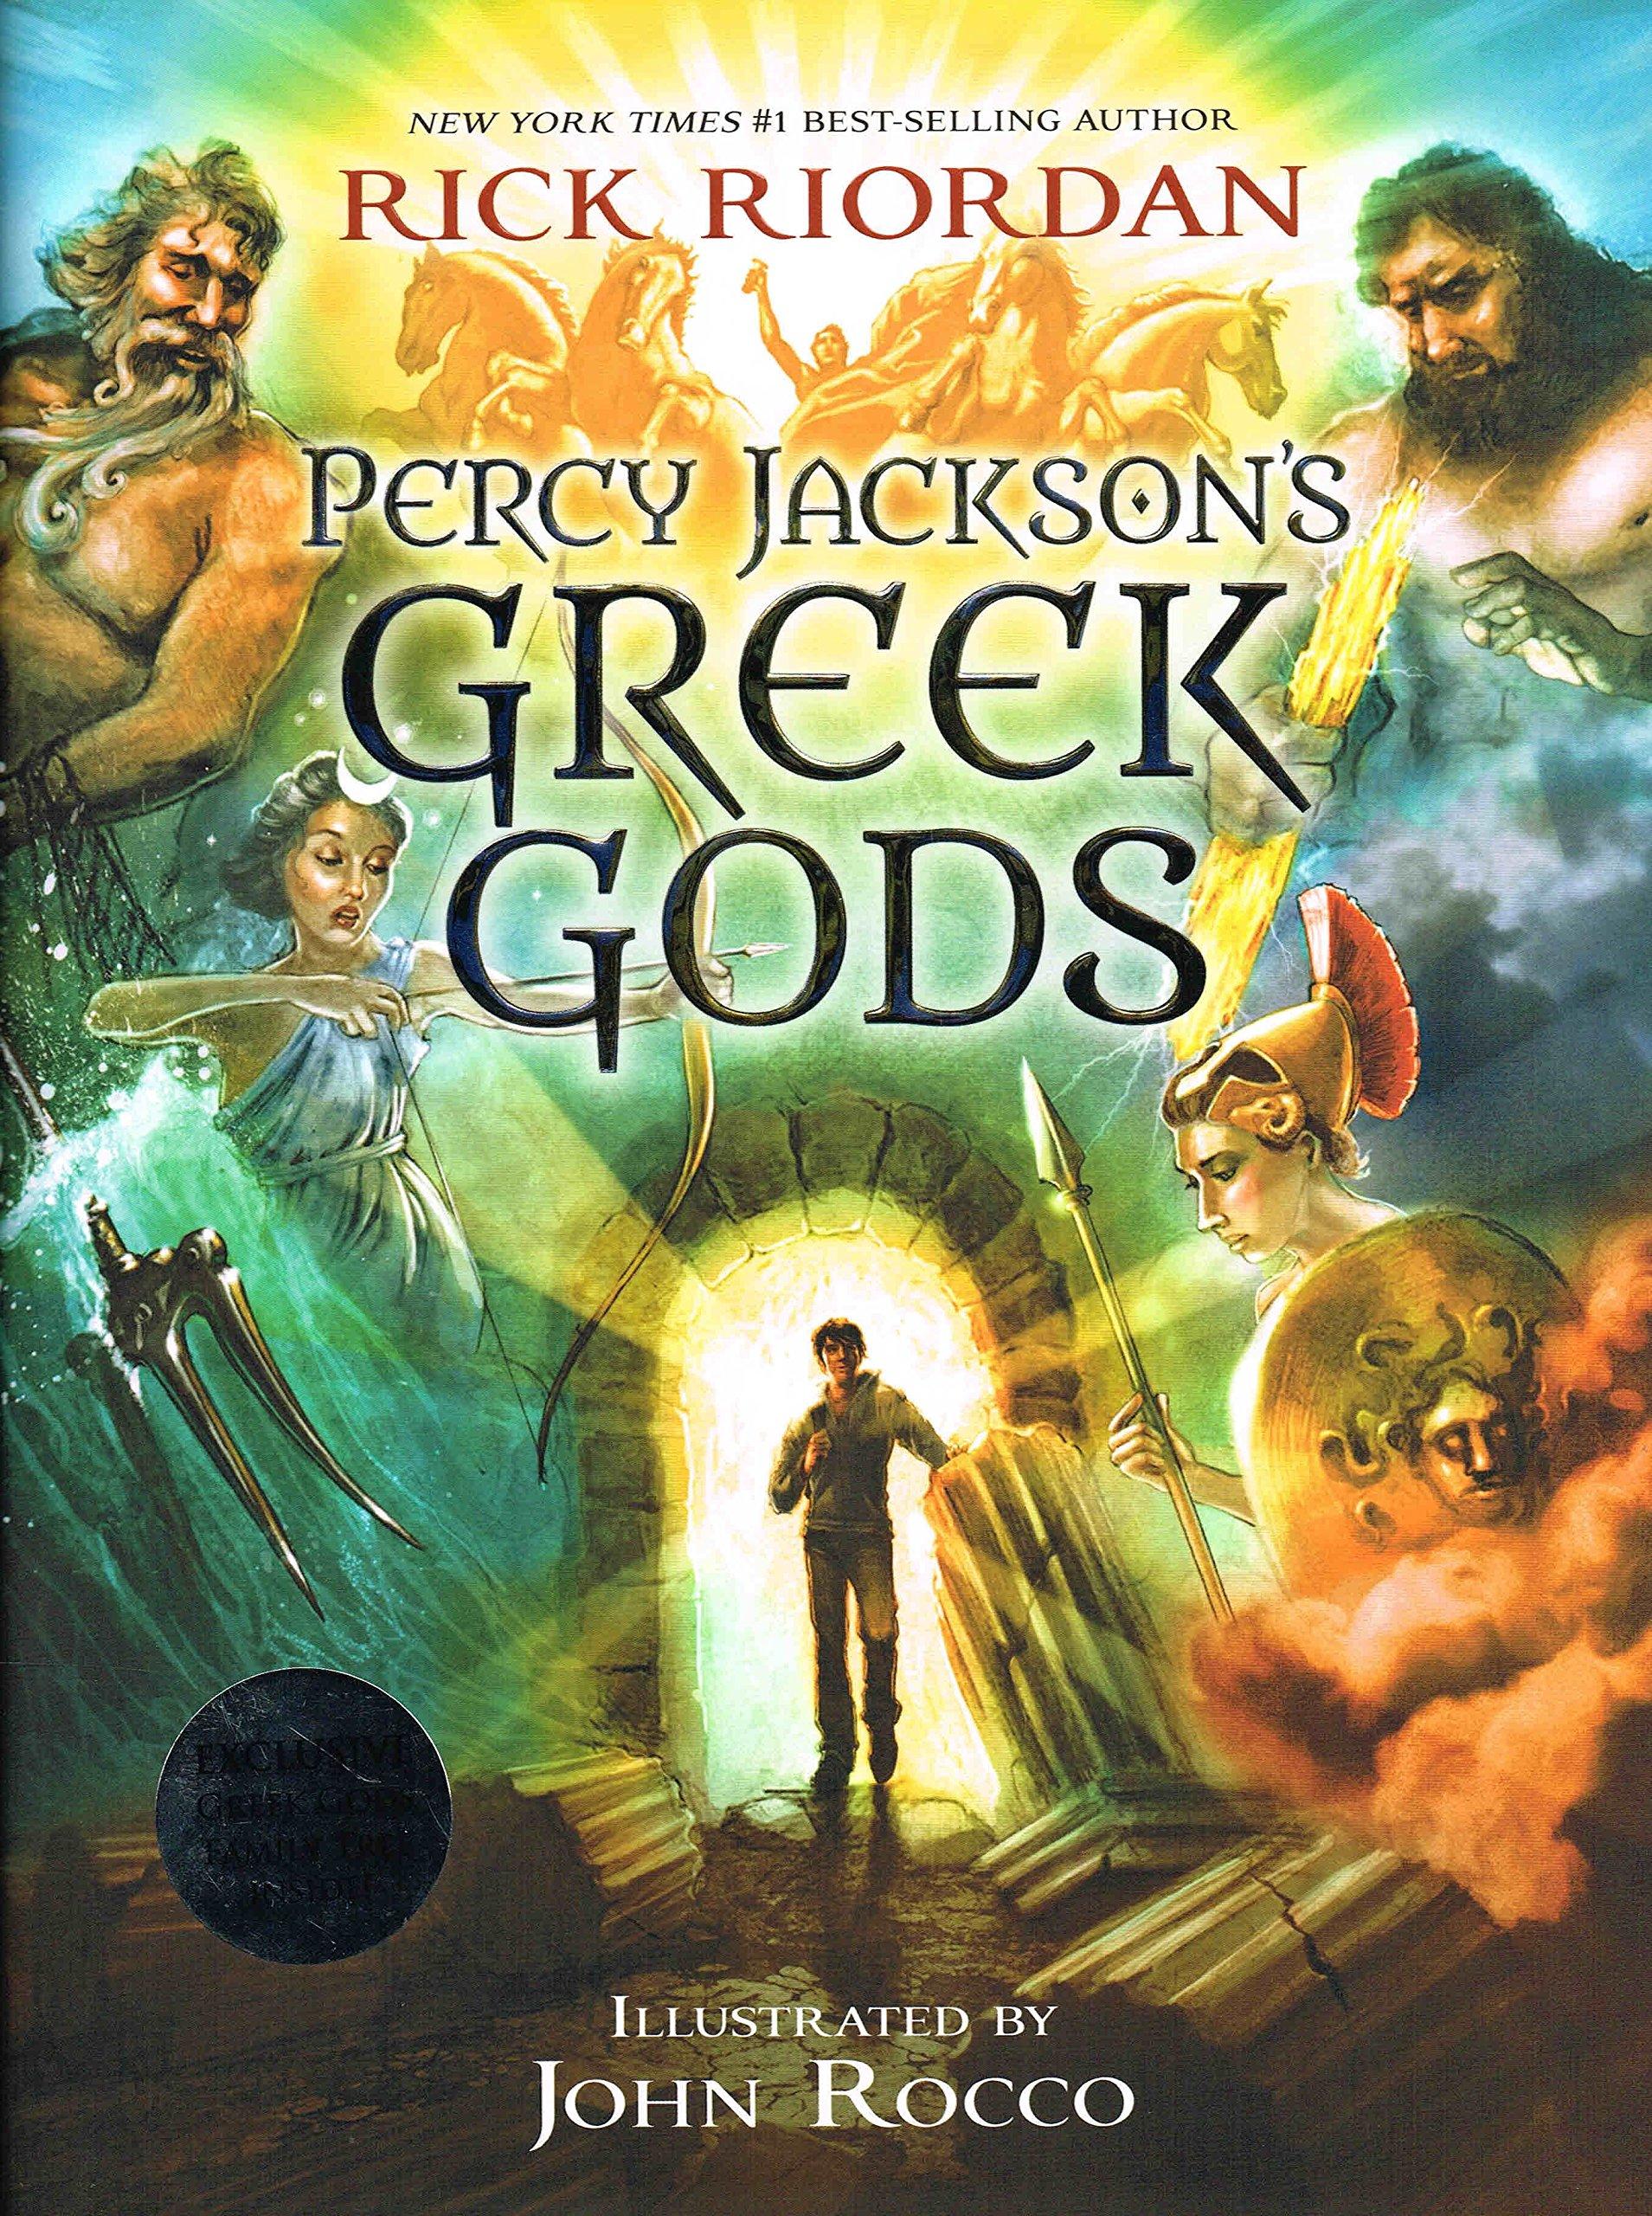 percy jackson s greek gods rick riordan 本 通販 amazon